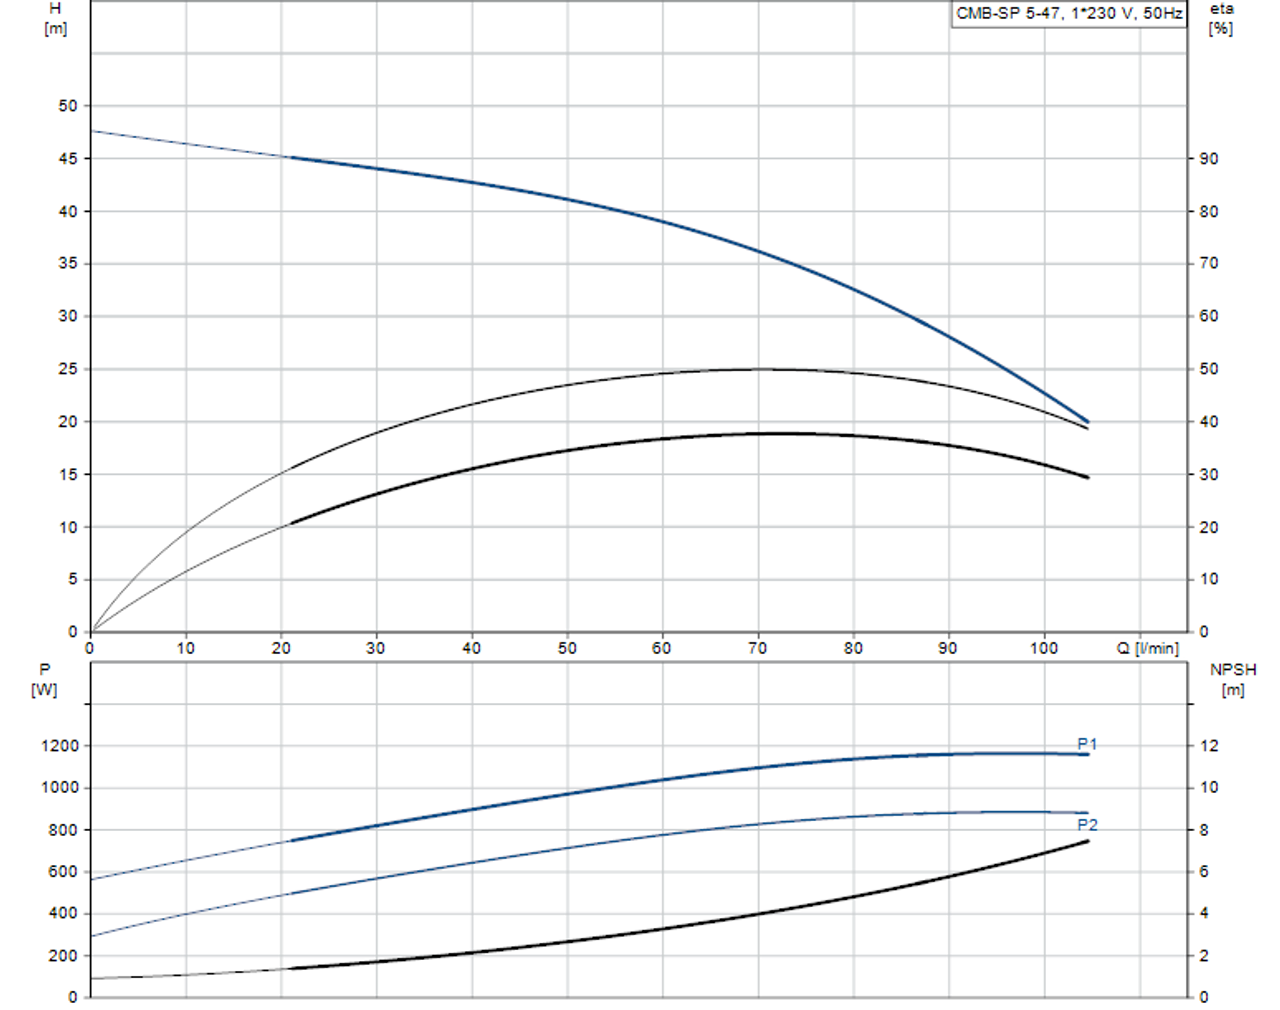 CMB-SP 5-47 Performance Curve